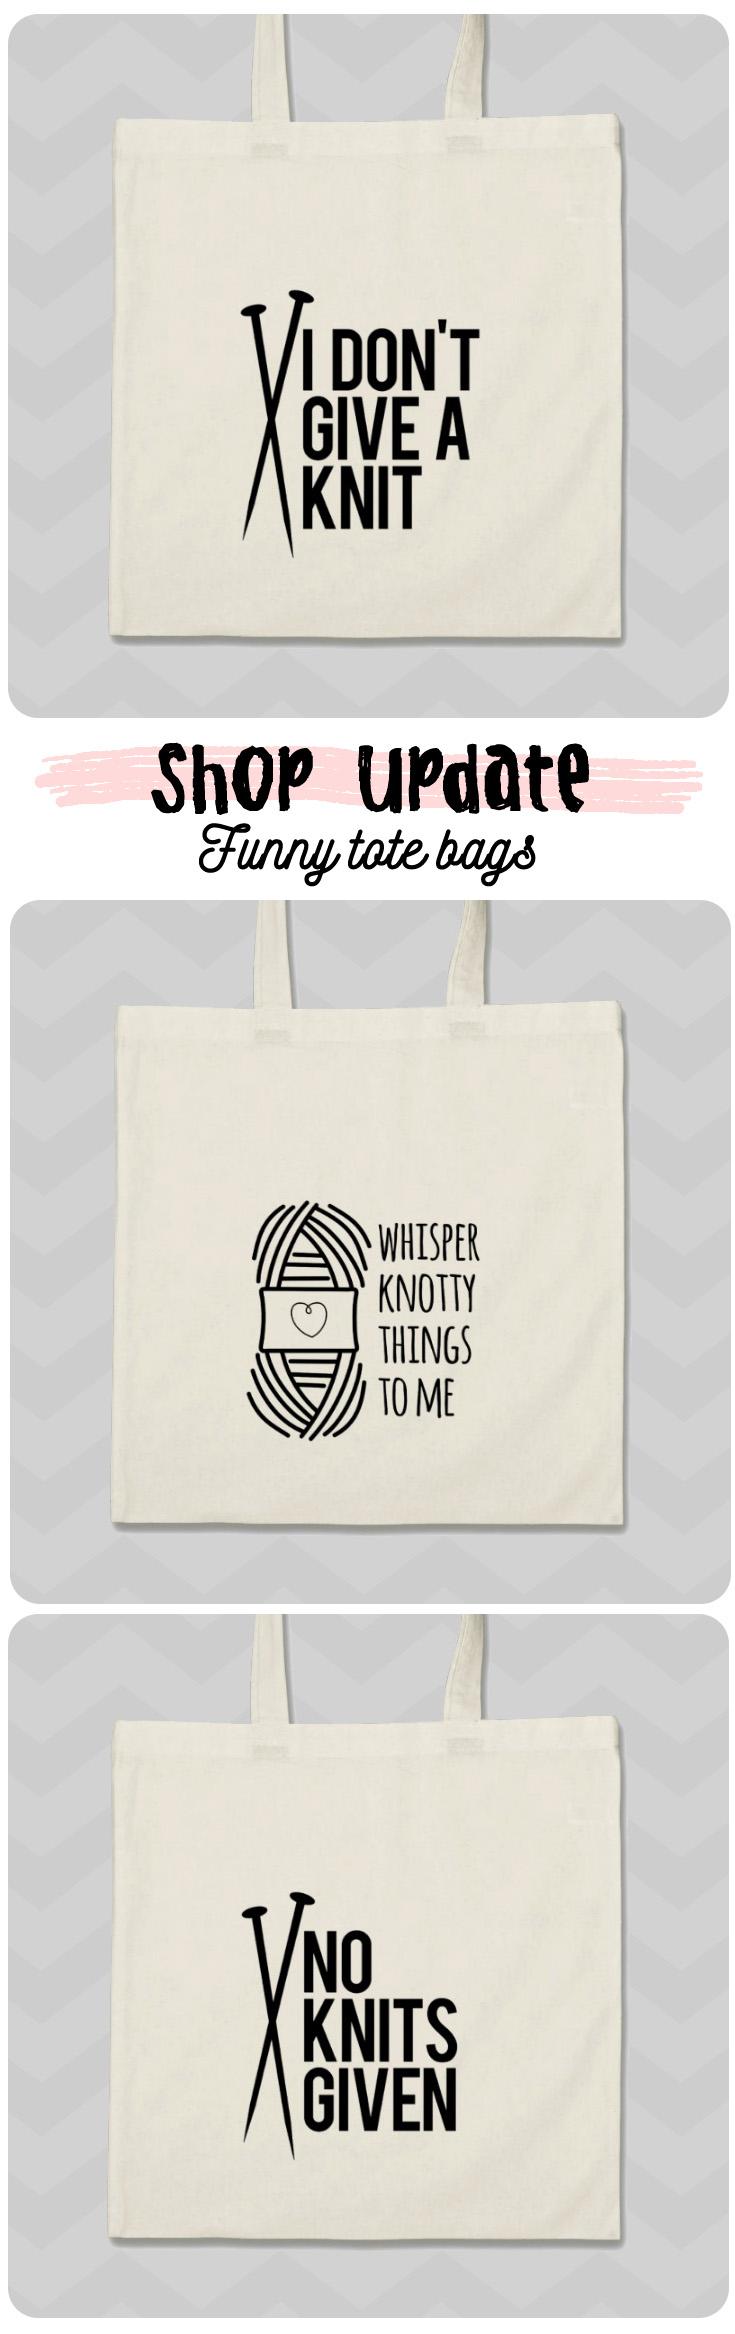 funny-tote-bags-pinterest.jpg